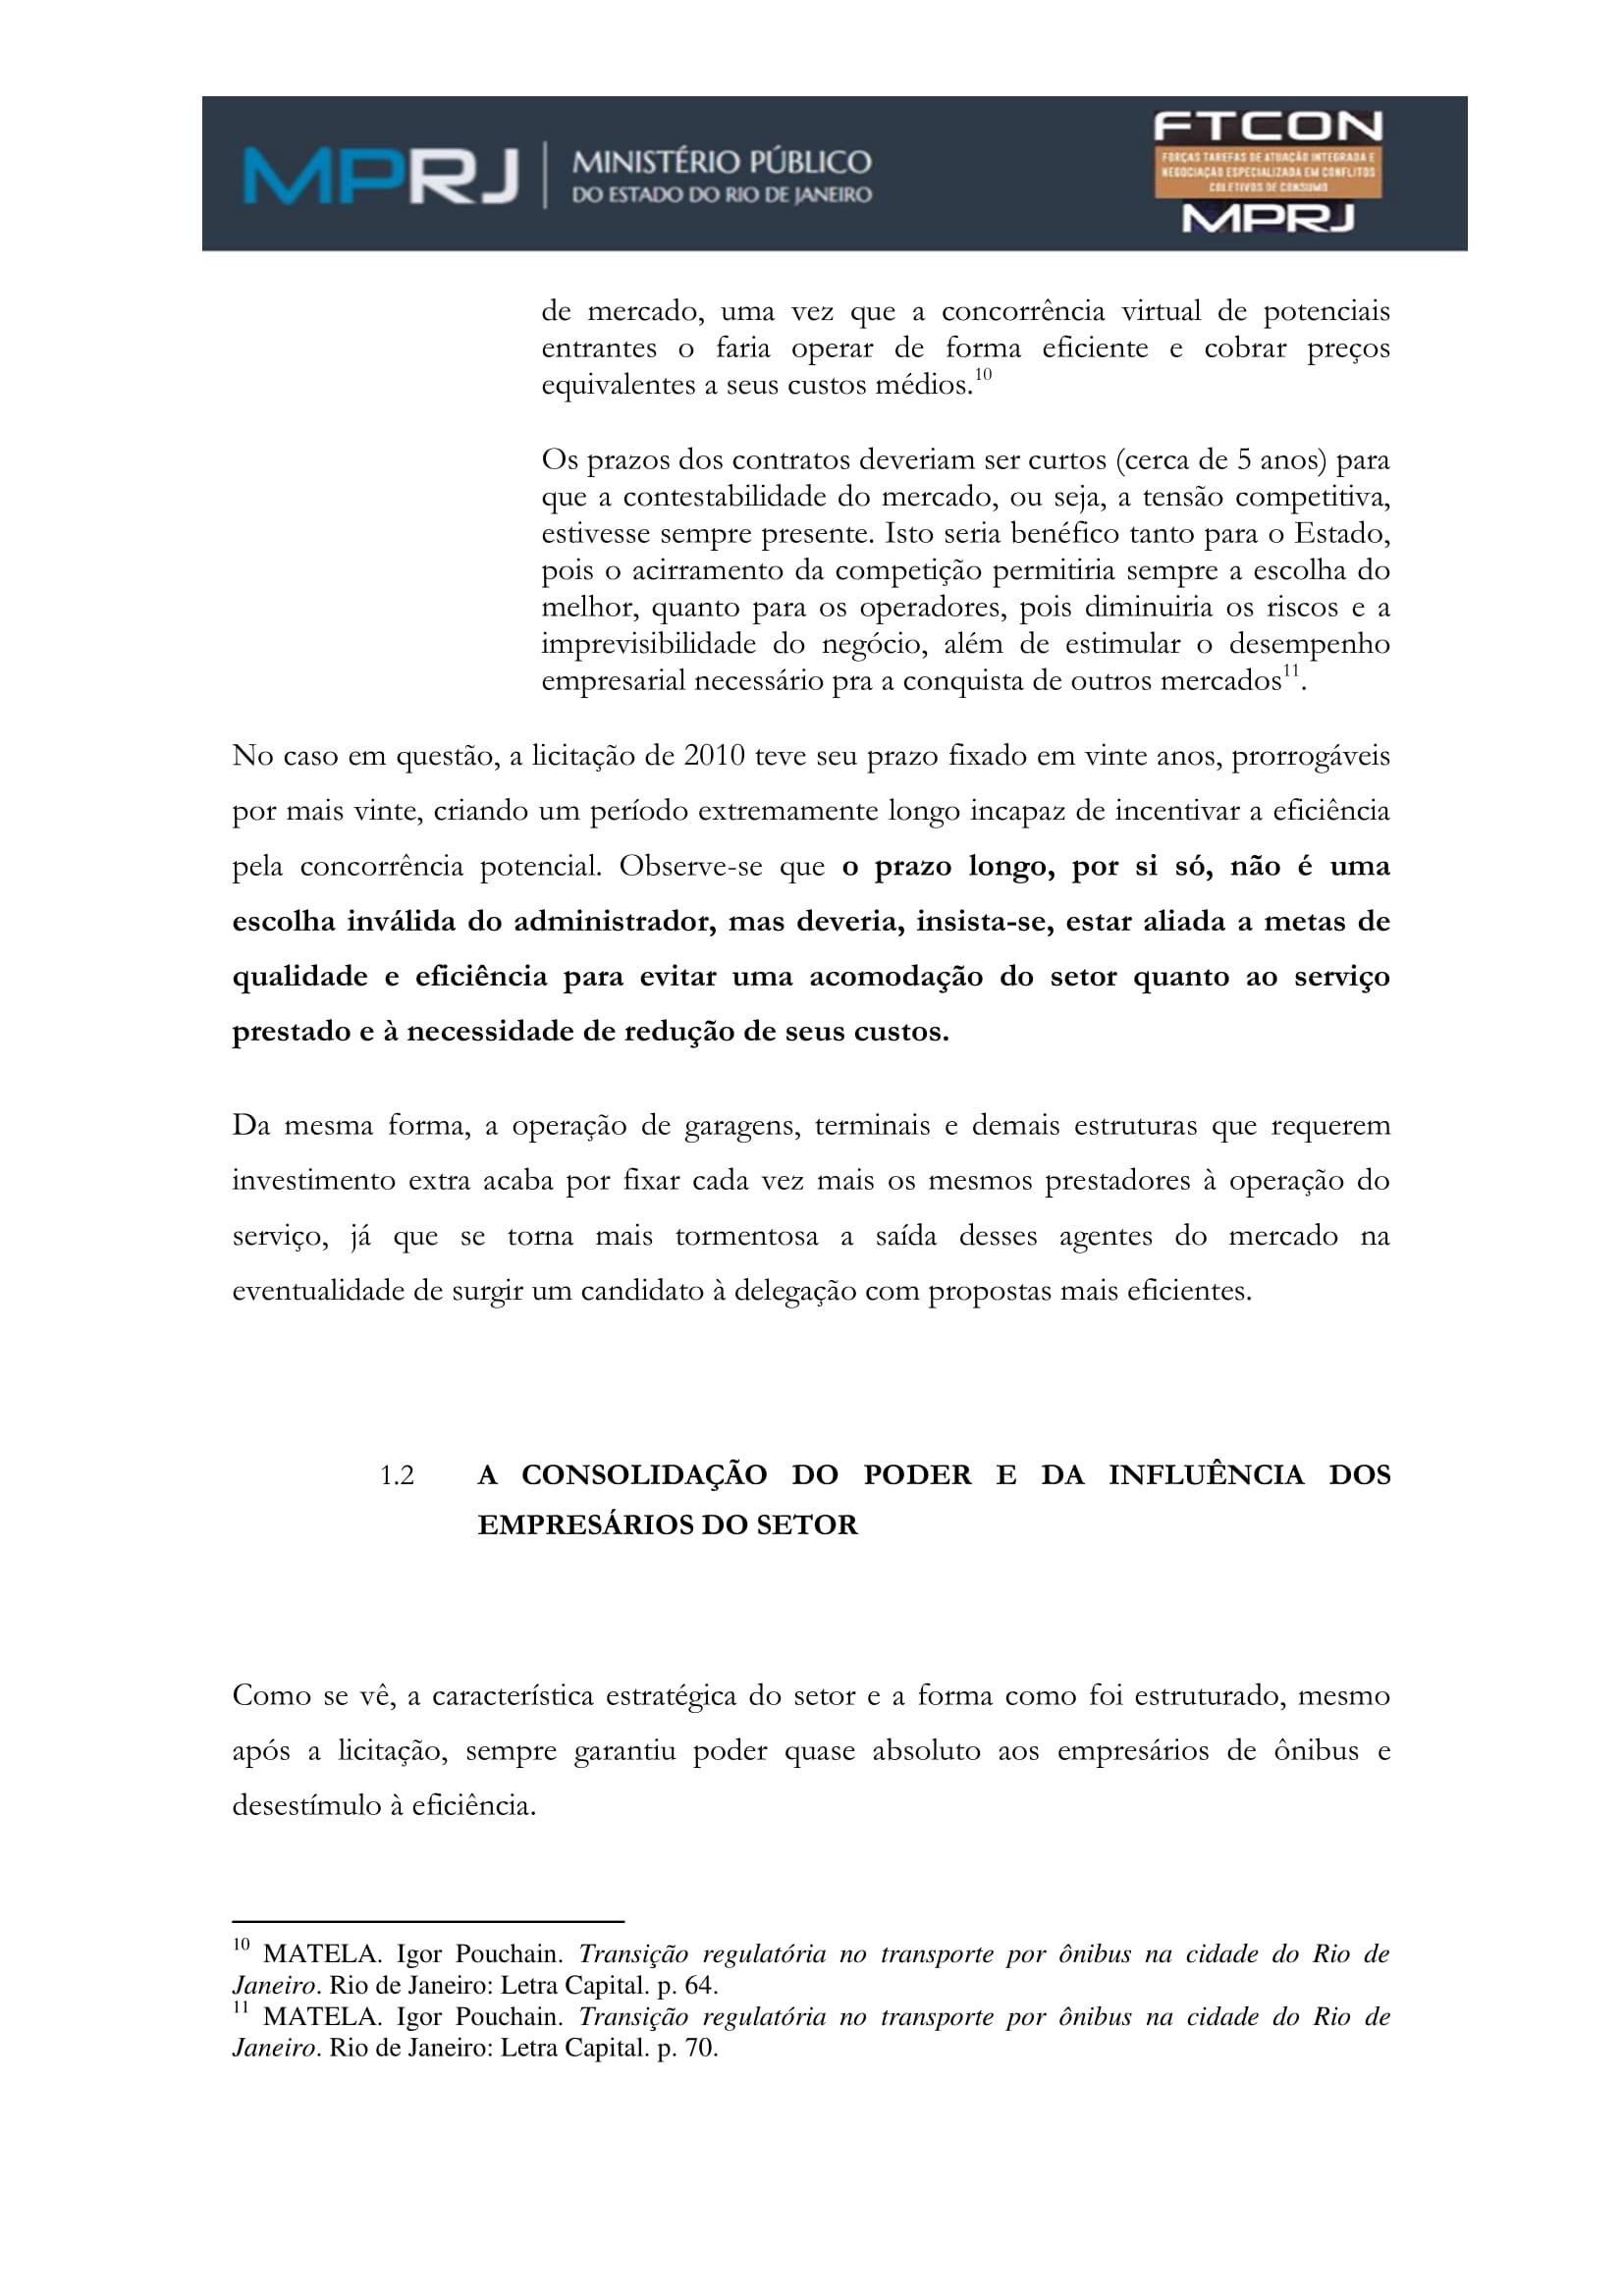 acp_caducidade_onibus_dr_rt-013